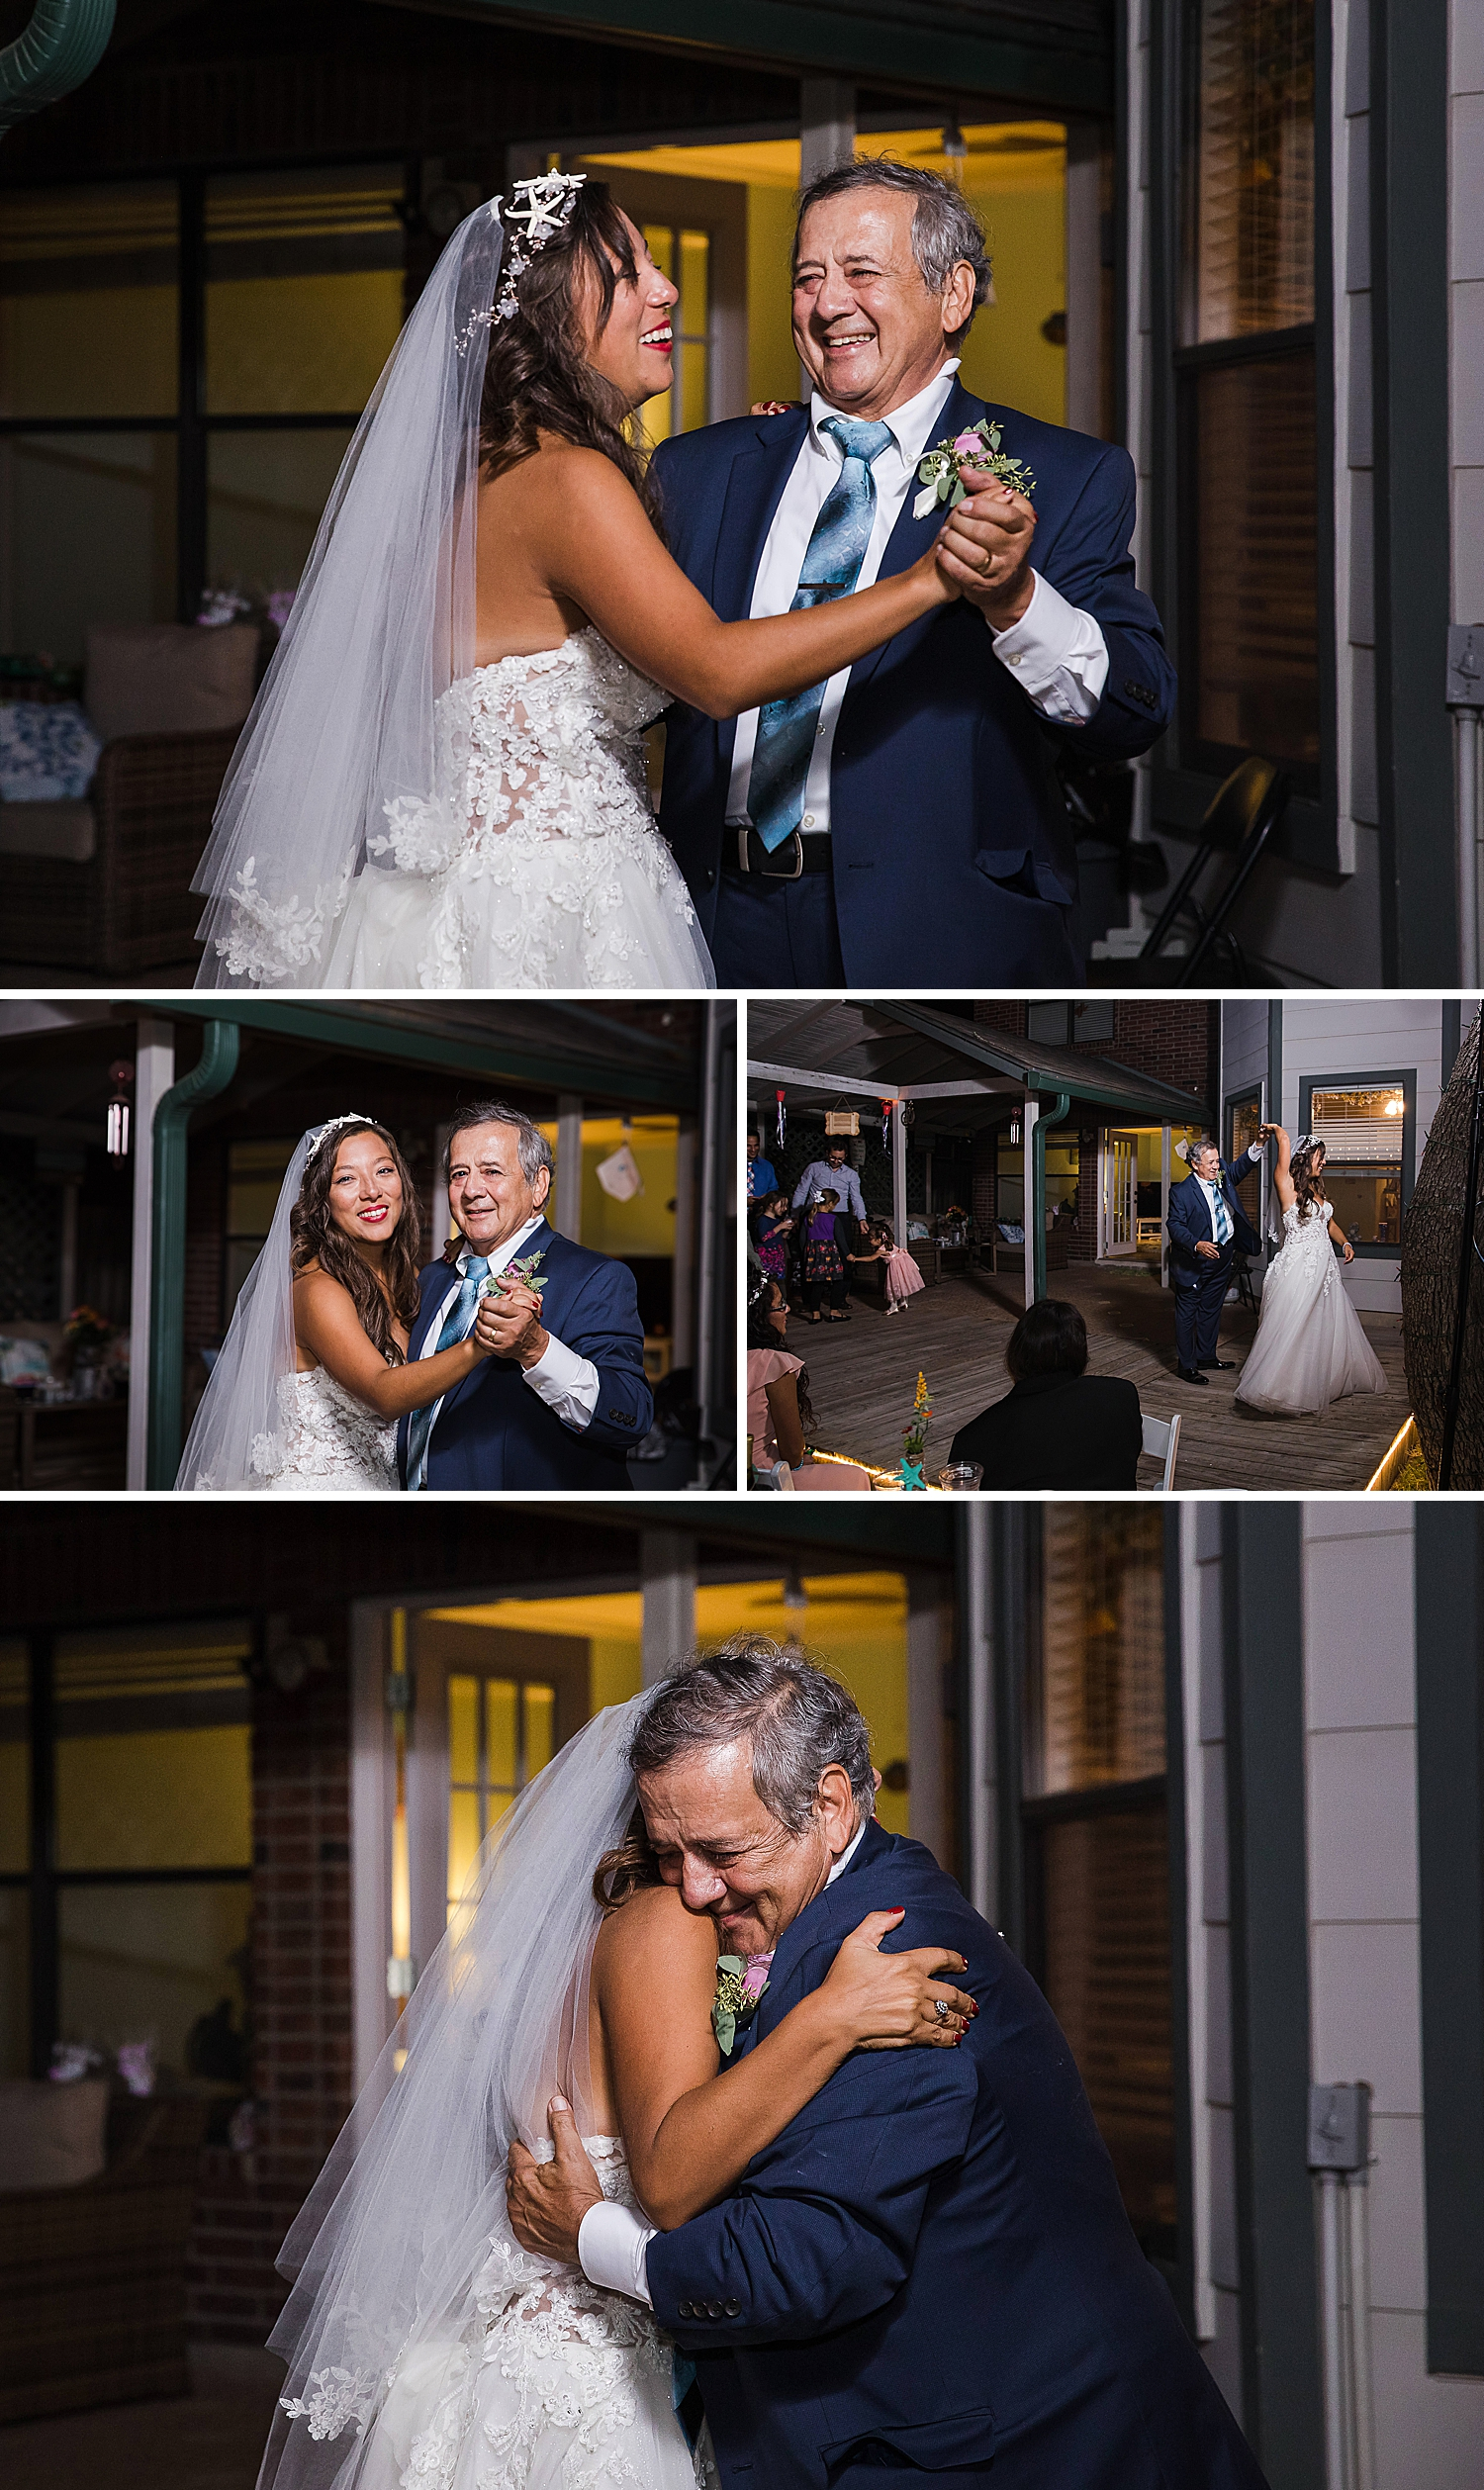 Bandera-Texas-Wedding-Photographer-Bride-Groom-on-Horses-Carly-Barton-Photography_0040.jpg